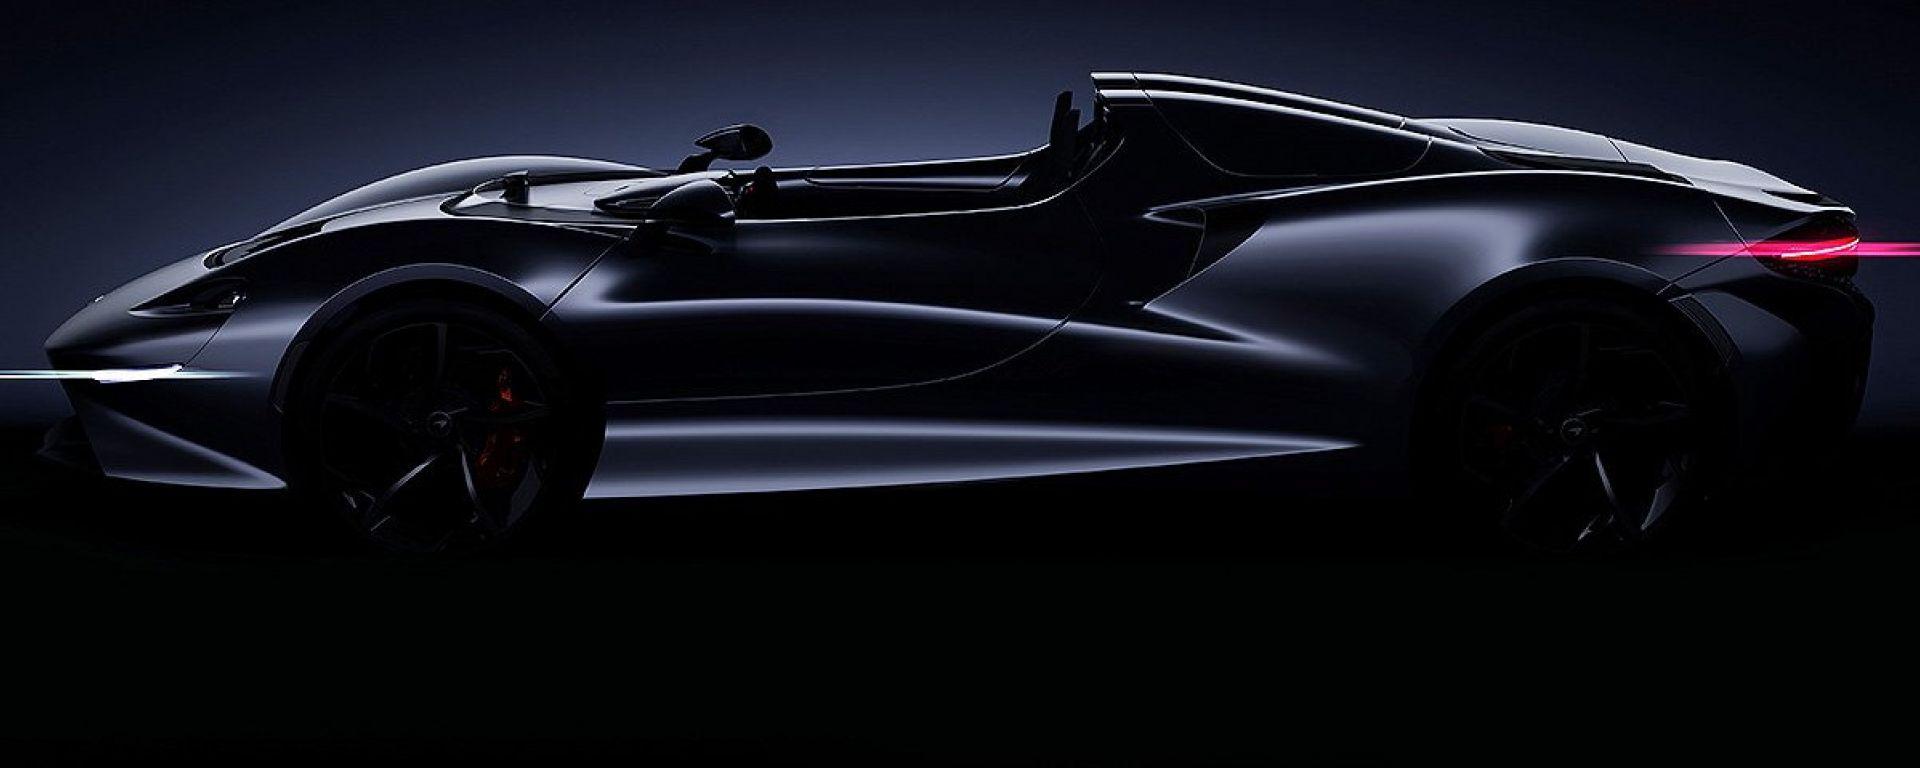 McLaren: in arrivo una spider ancora senza nome